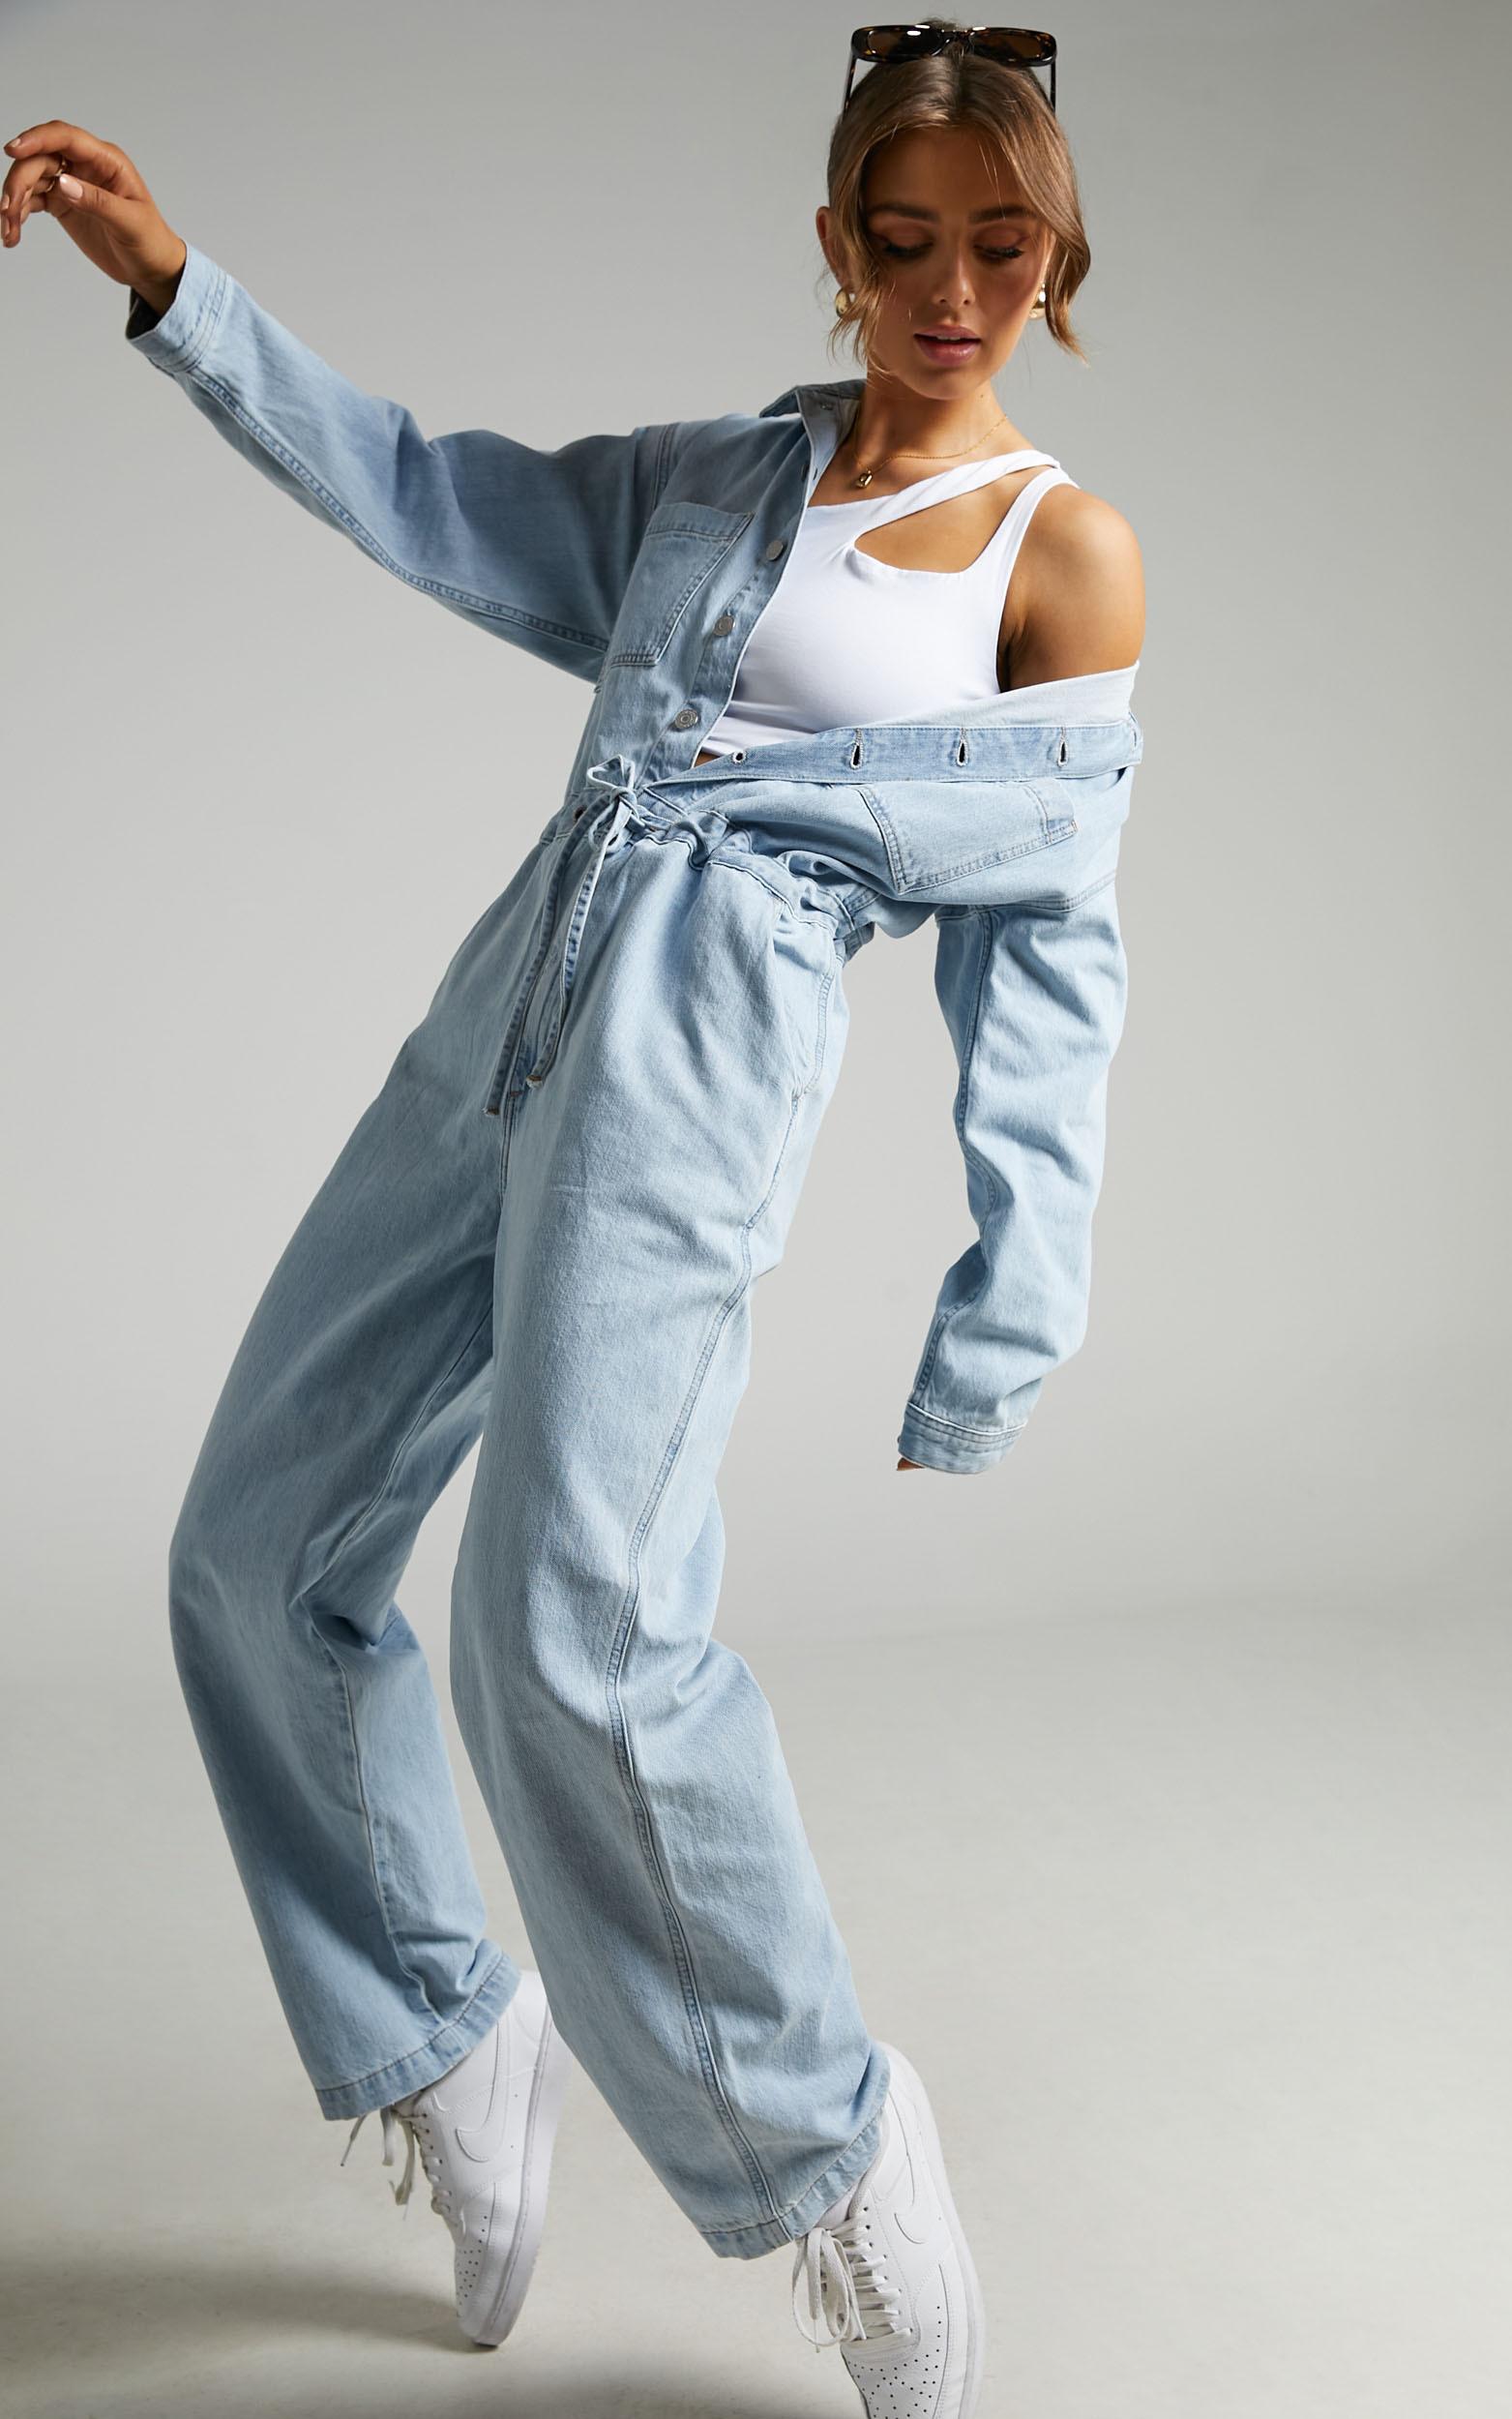 Levis - Roomy Jumpsuit in My Feels - 06, BLU1, hi-res image number null